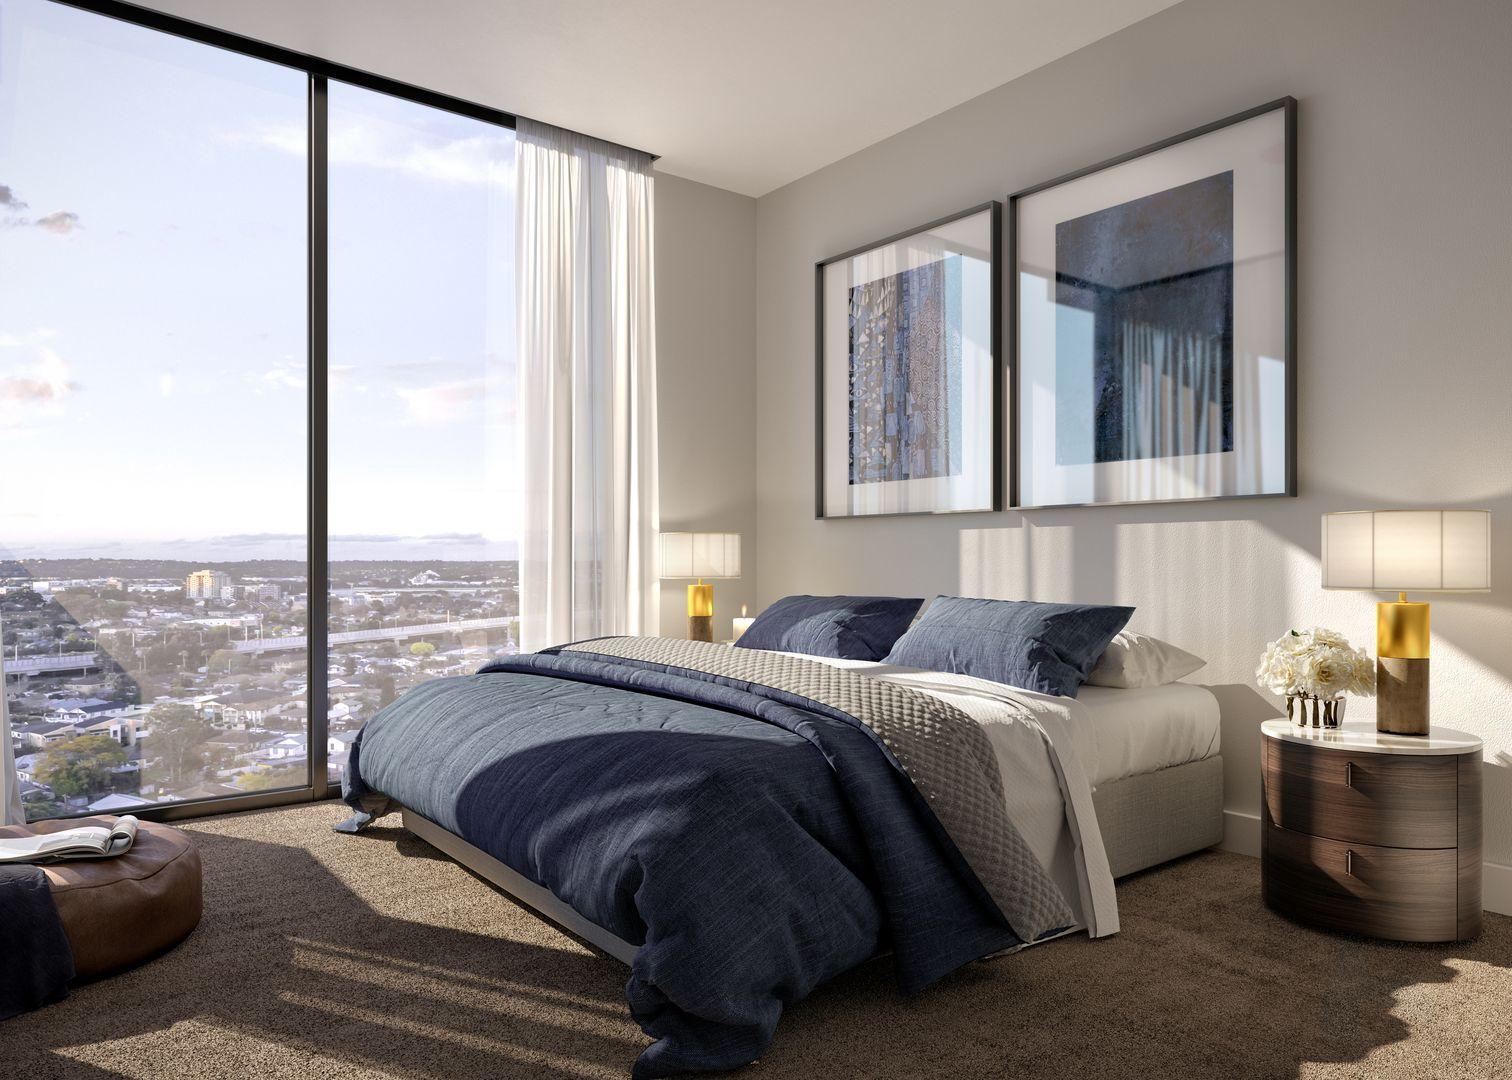 2 bed/38 Cowper Street, Granville NSW 2142, Image 0